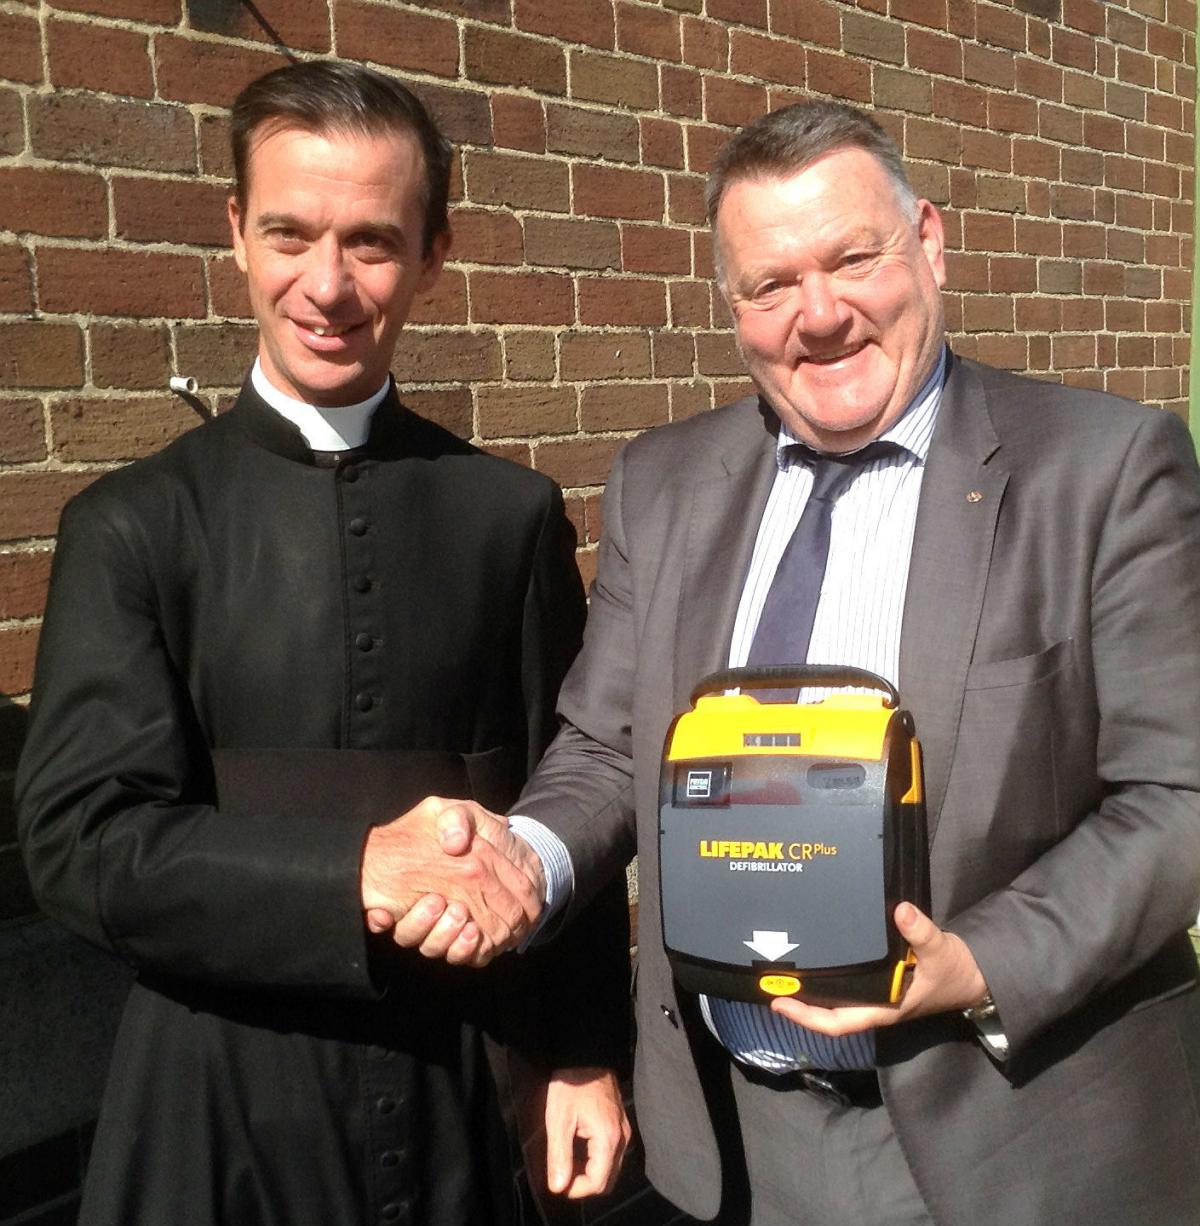 Our Public Access Defibrillator replaced